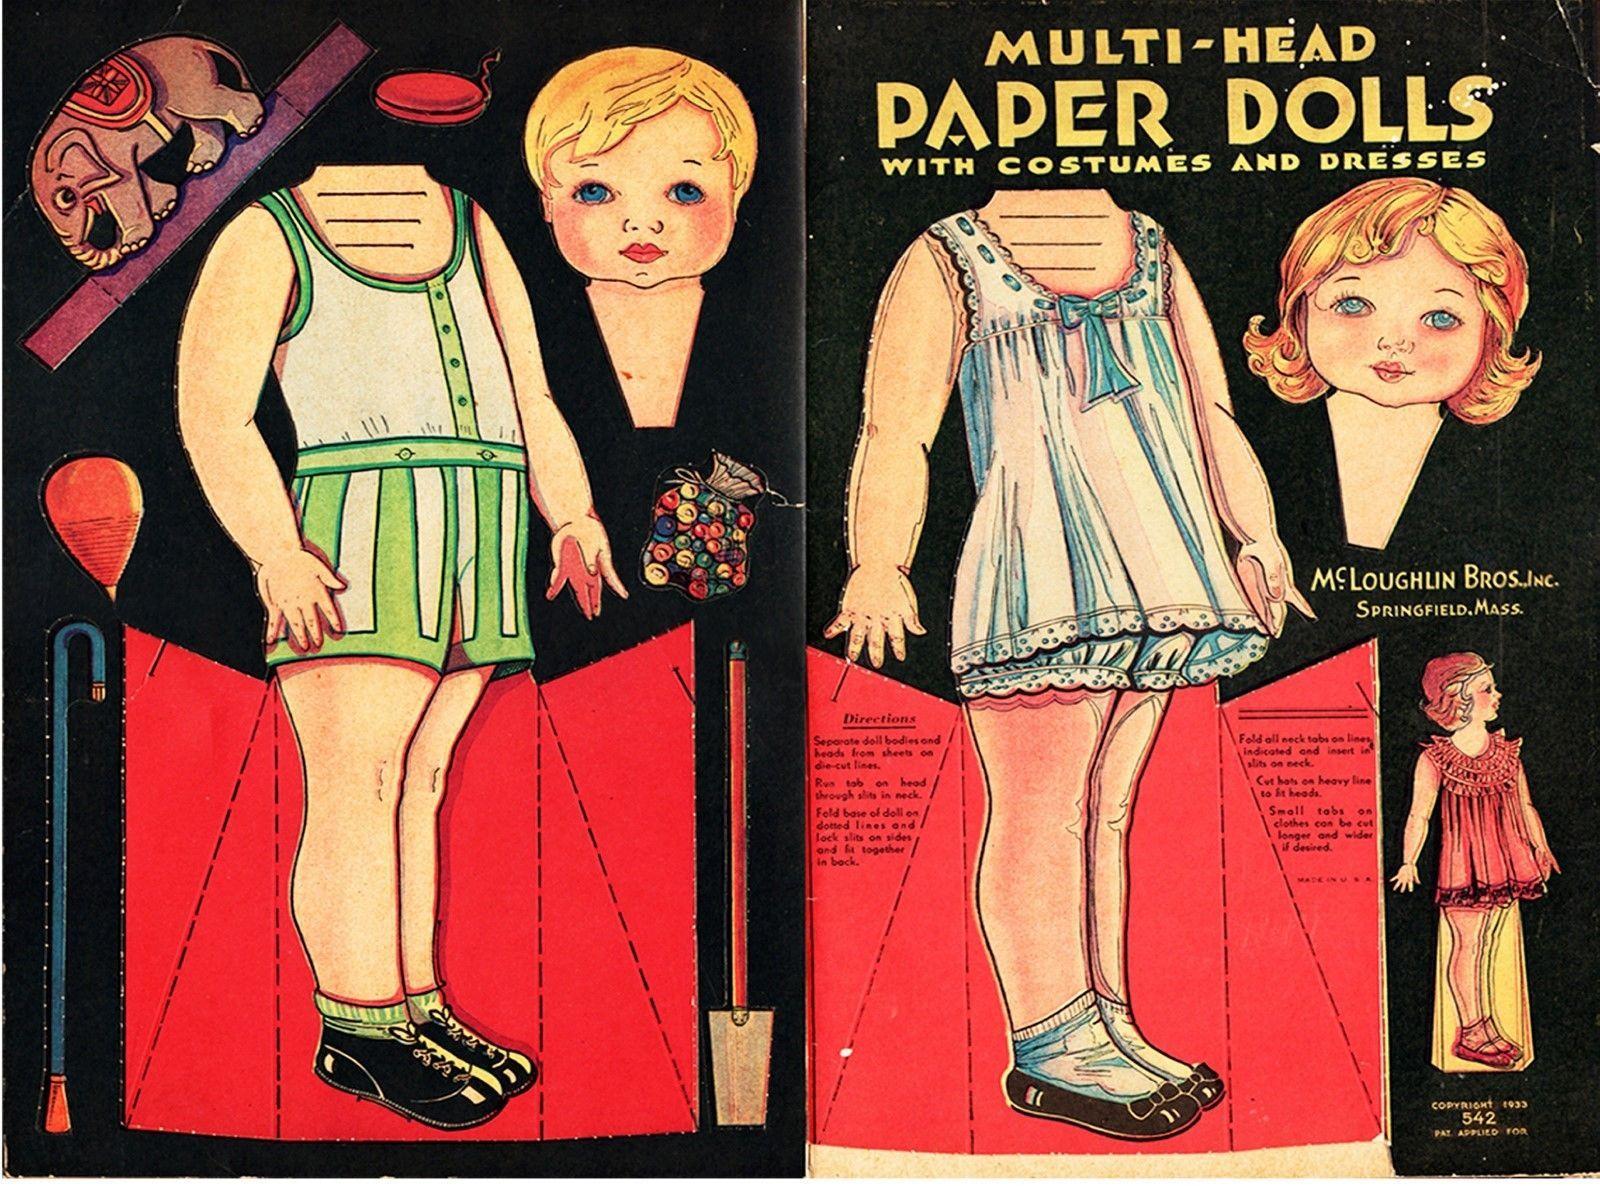 Antique Original Uncut 1933 Multi Head Paper Dolls MC Loughlin Bros Inc | eBay